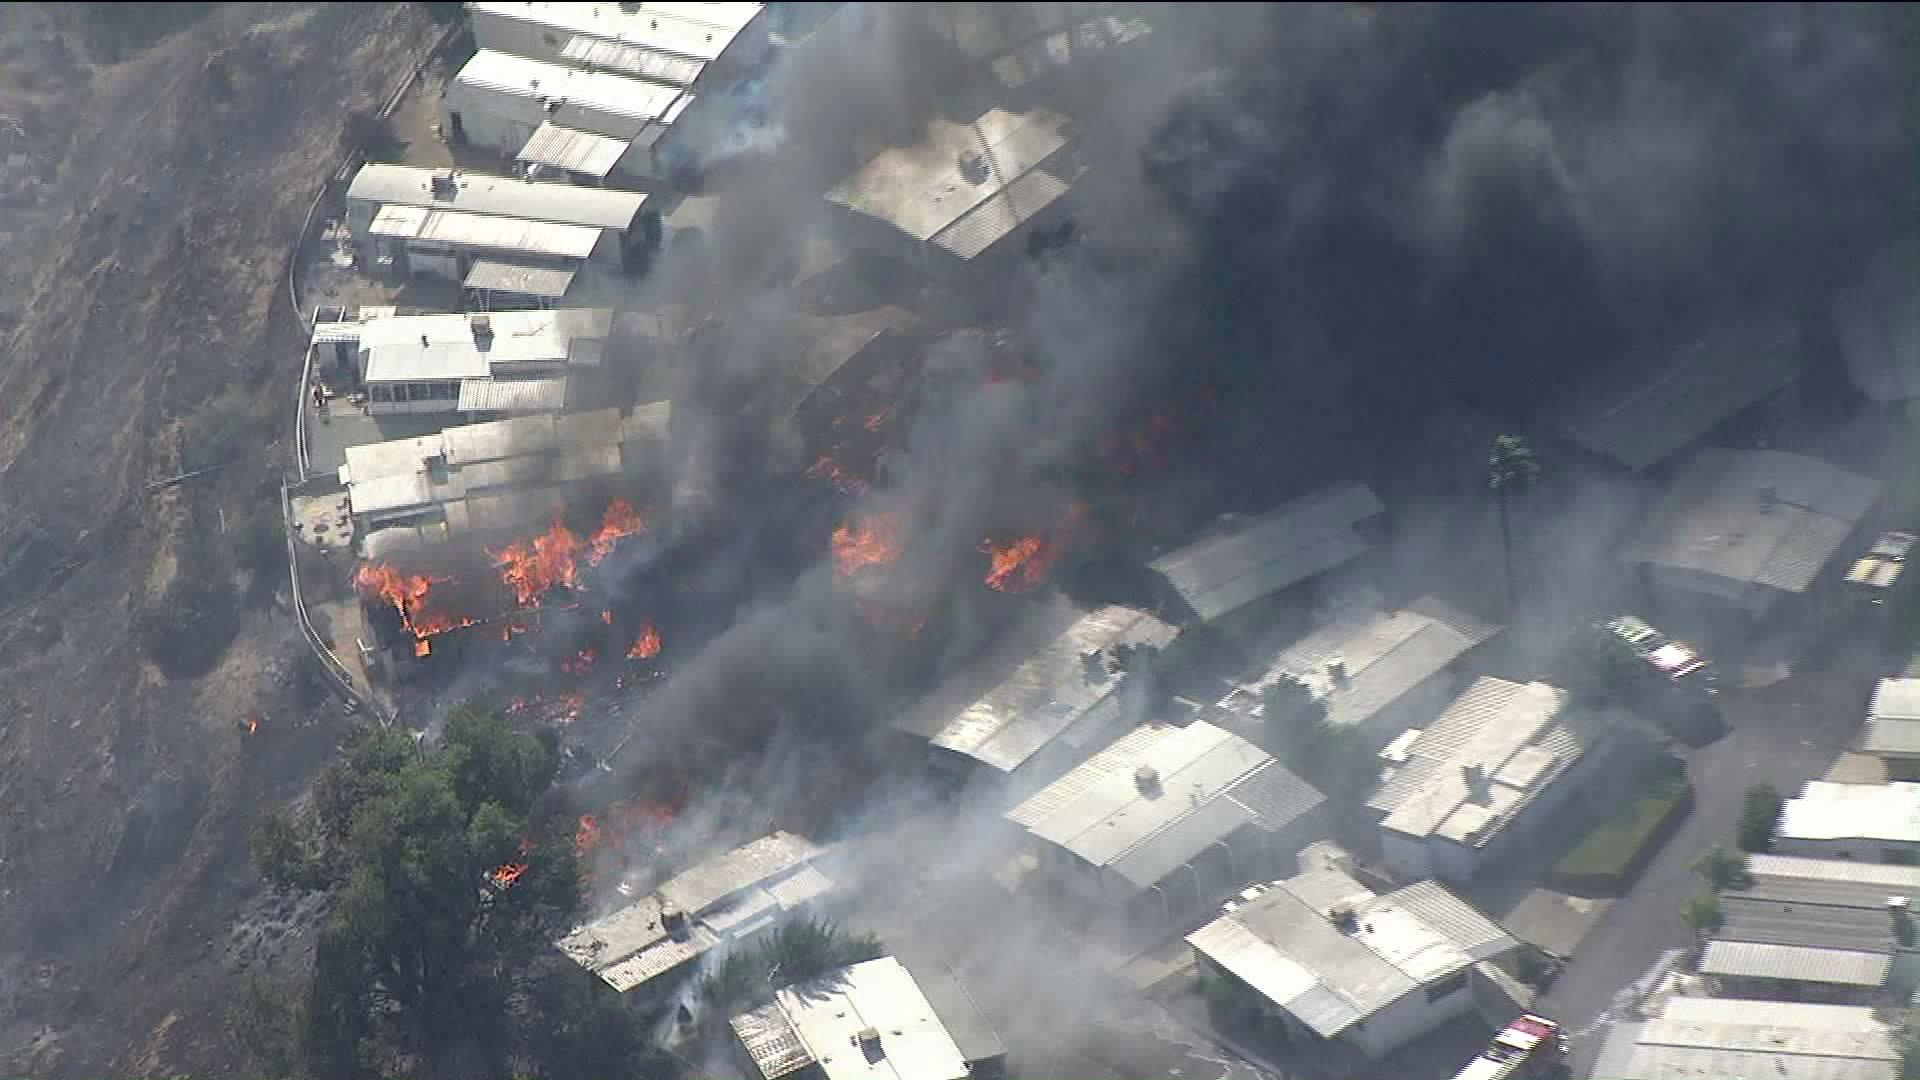 The Sandalwood Fire leaves several homes destroyed at a mobile home park in Calimesa on Oct. 10, 2019. (Credit: KTLA)